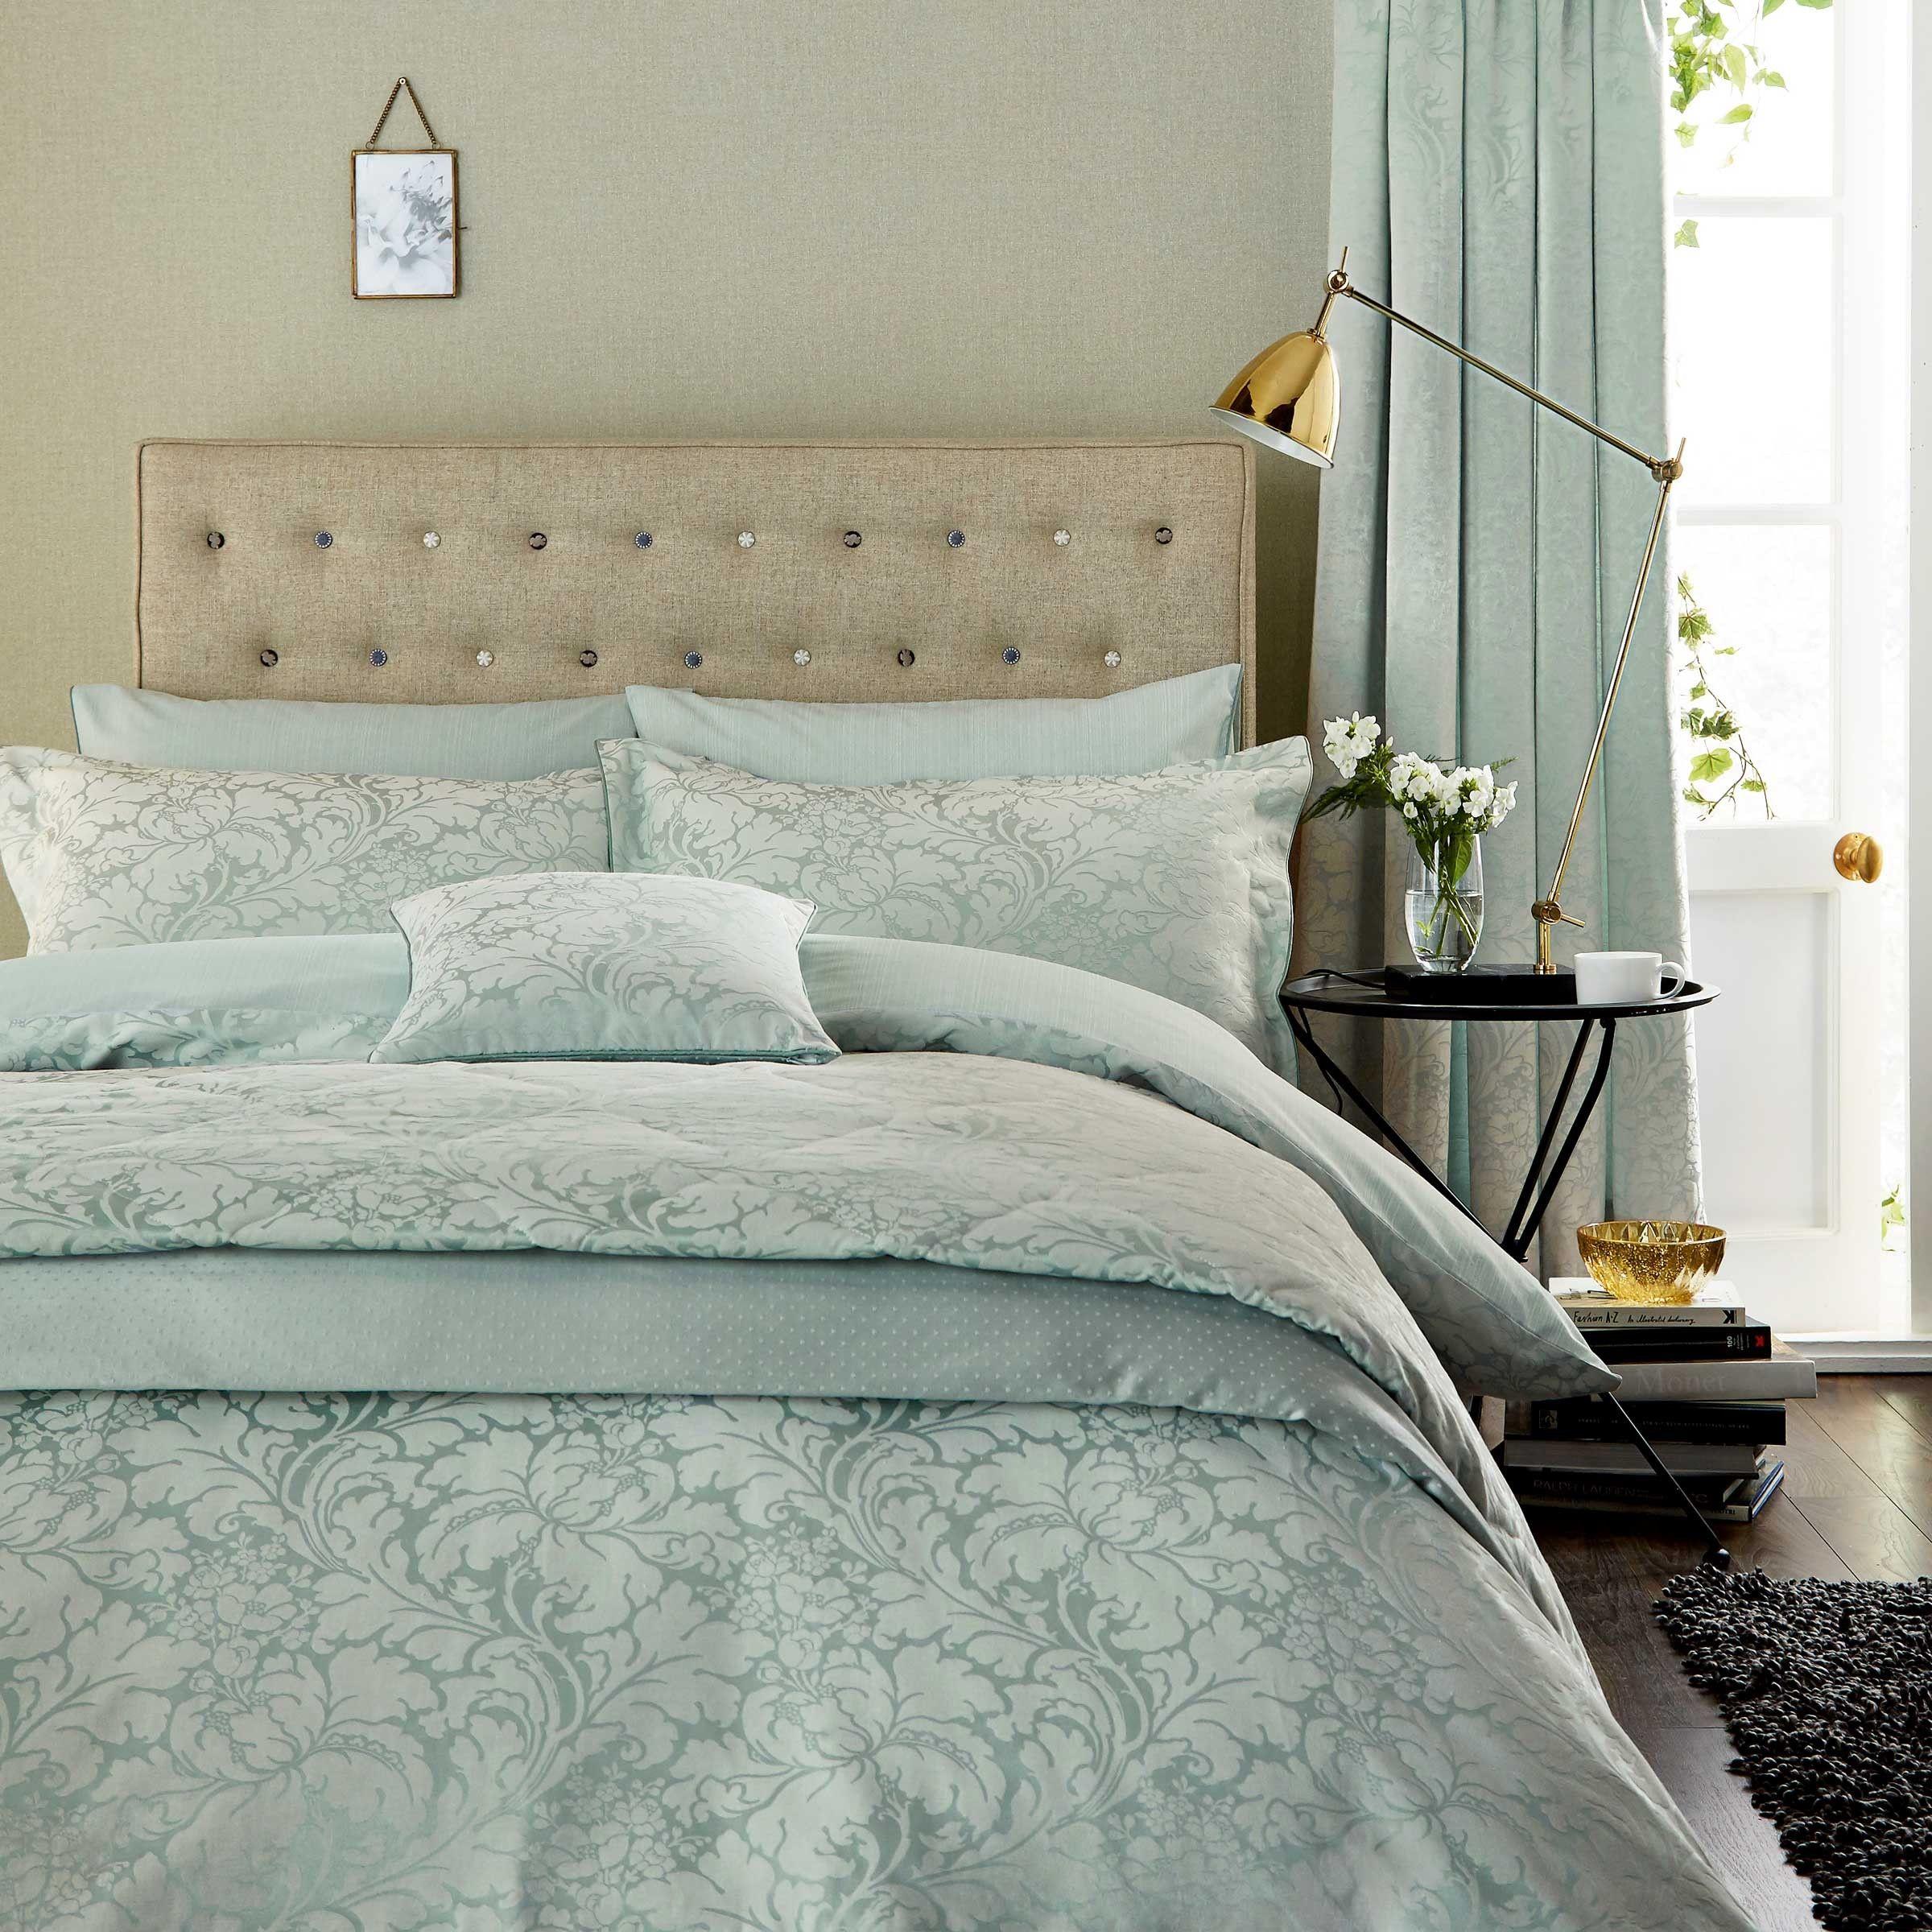 bed green best ideas sea on regarding comforter household sets aqua set bedding and glass